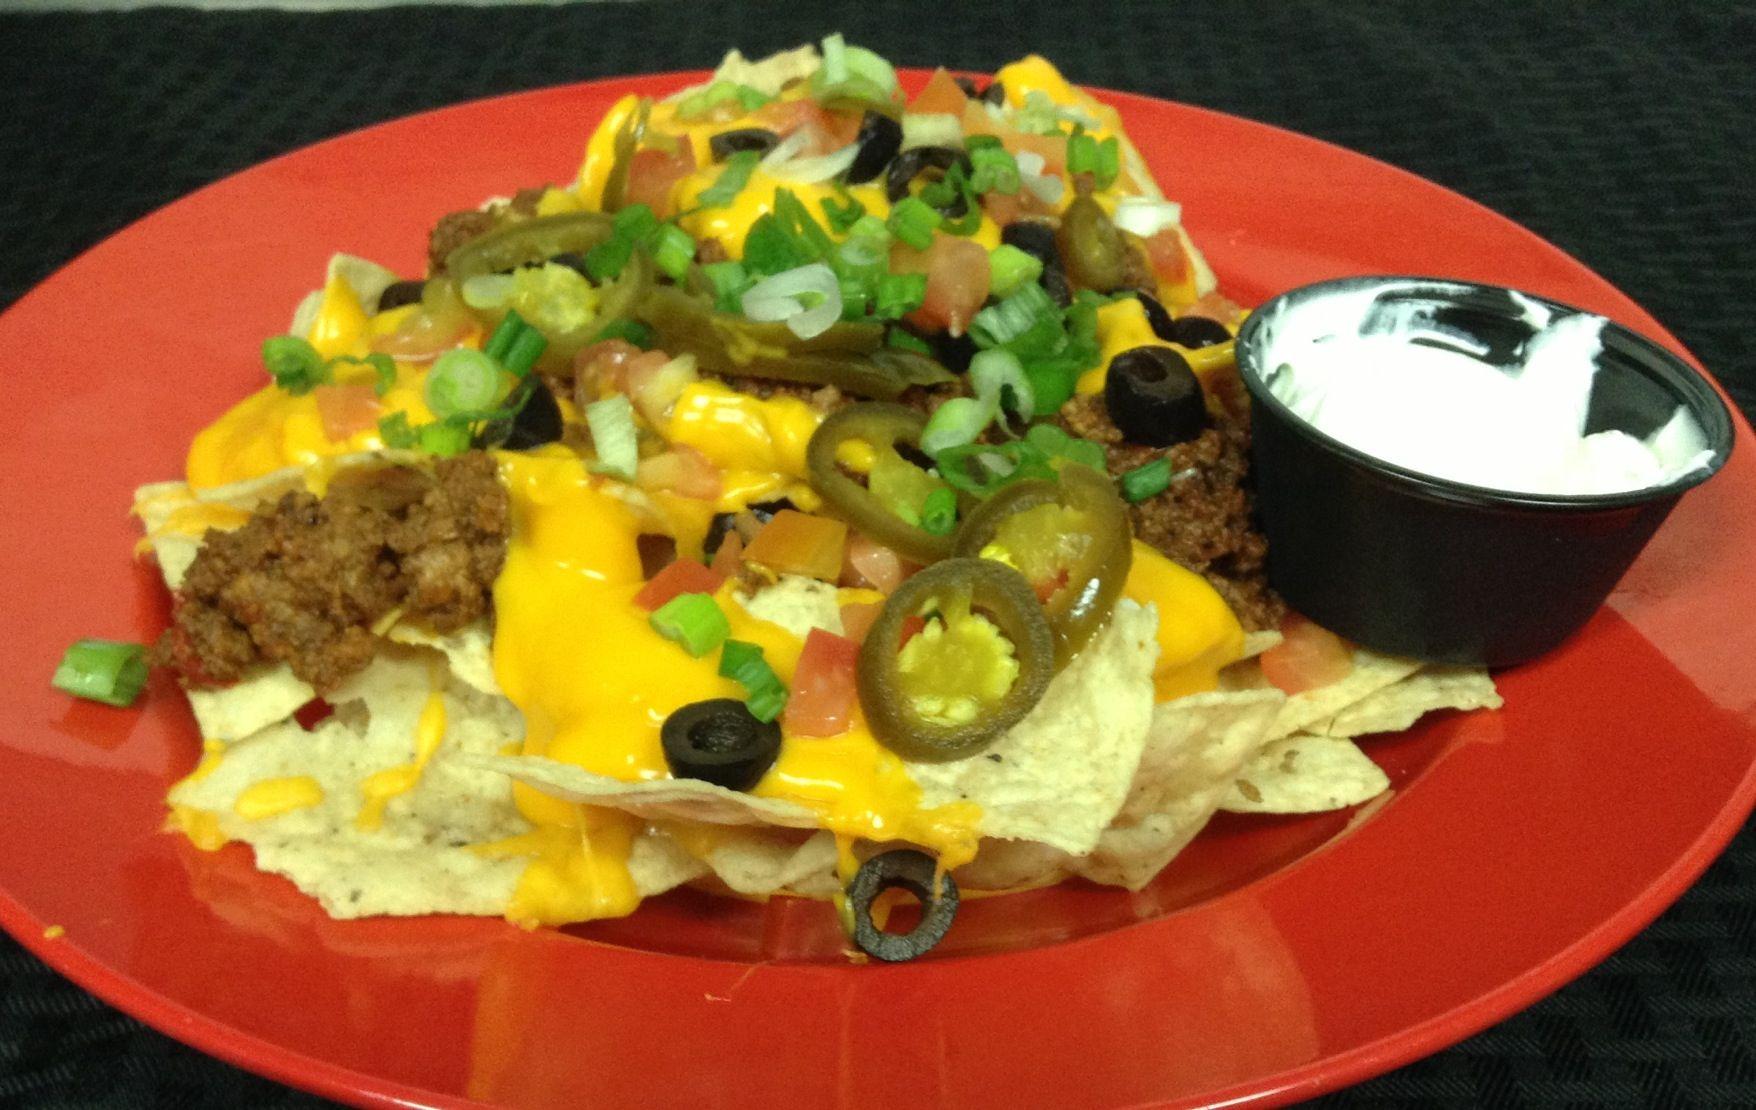 Mile High Nacho Food, Tasty dishes, Good food